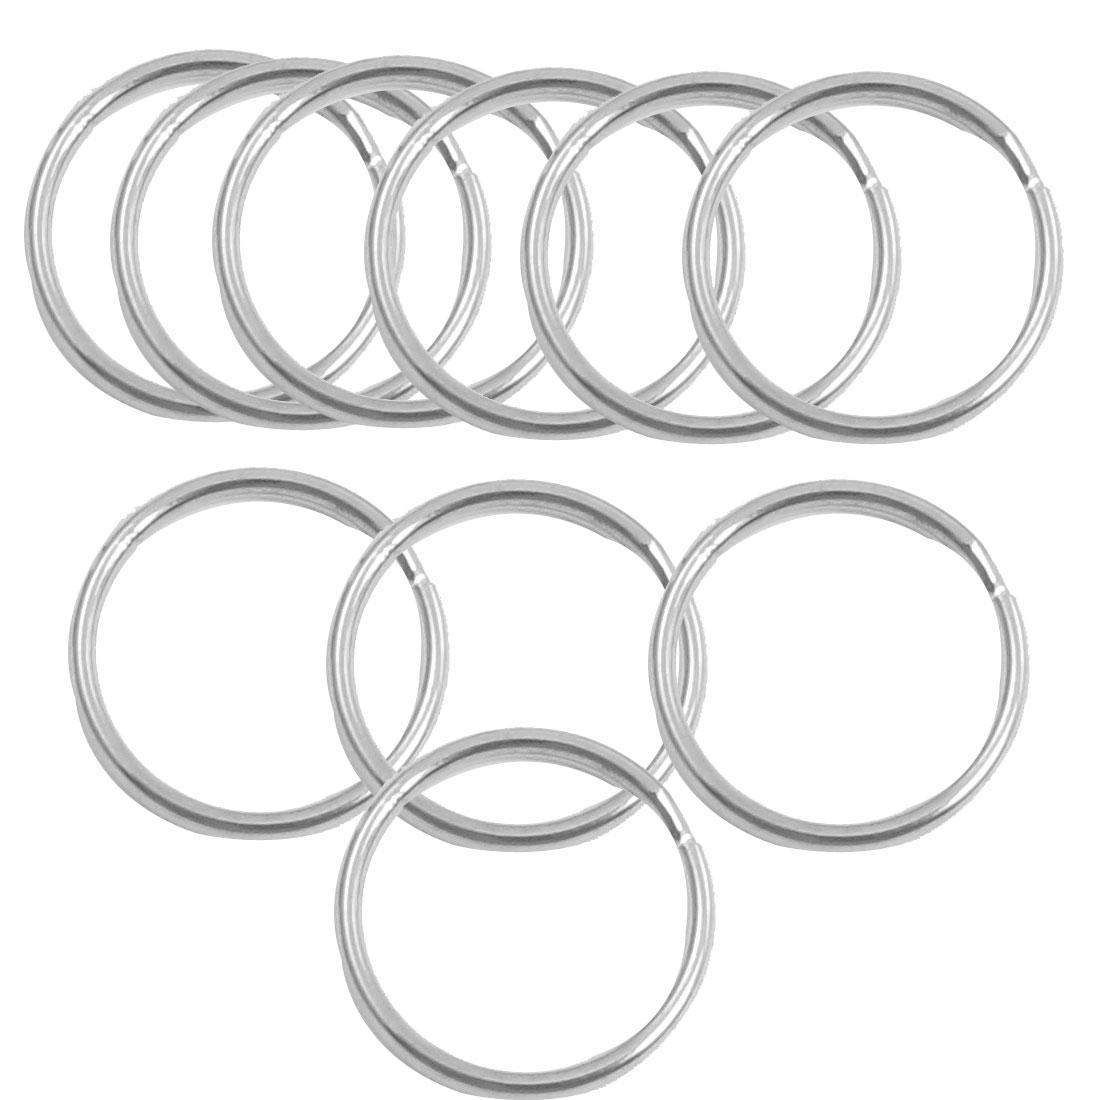 Silver Tone Metal Double Loops Split Ring Keyring 10pcs